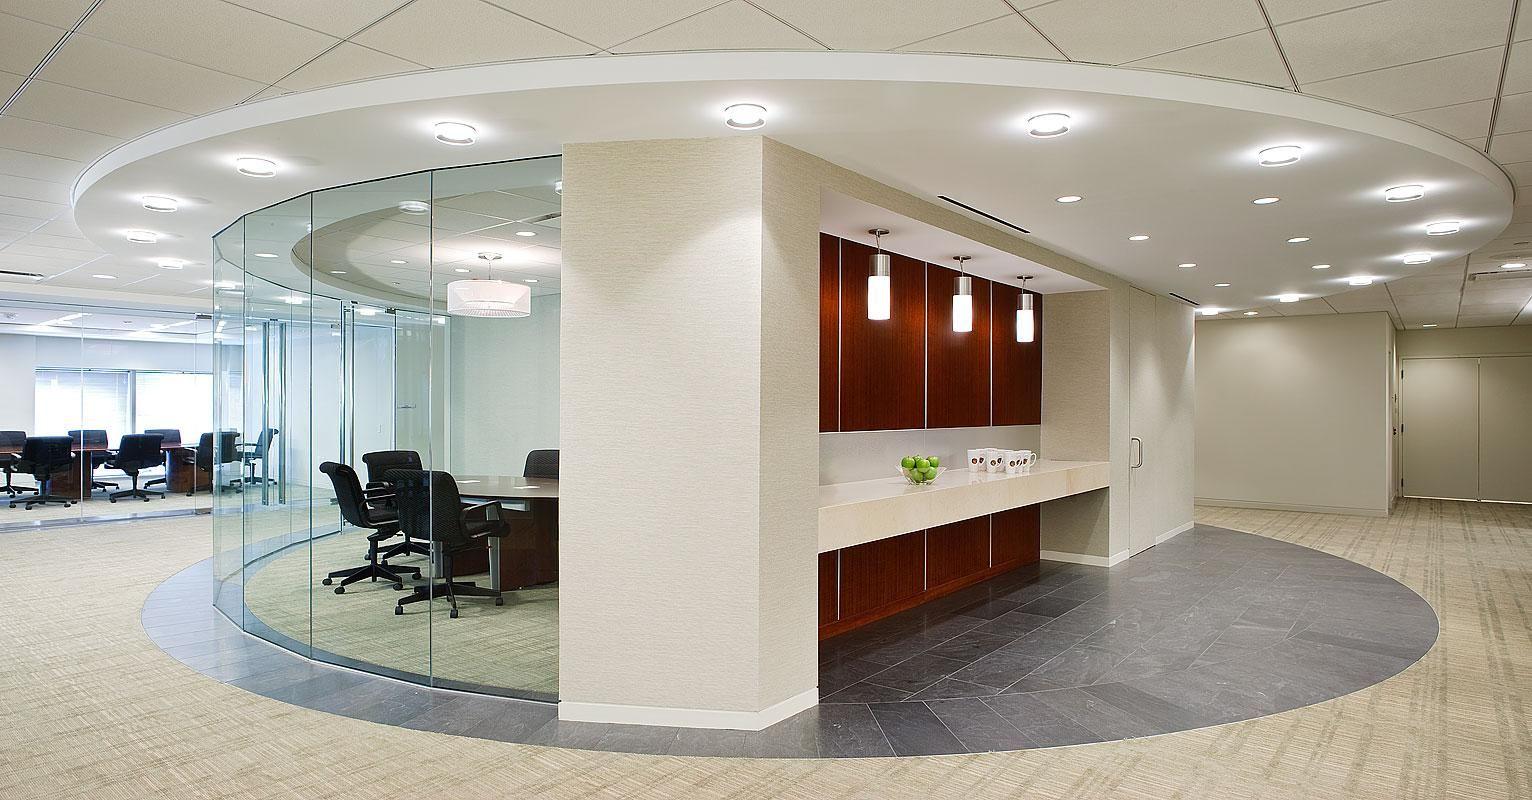 Law Firm Design | Law Firm Building Designs | Pinterest ...